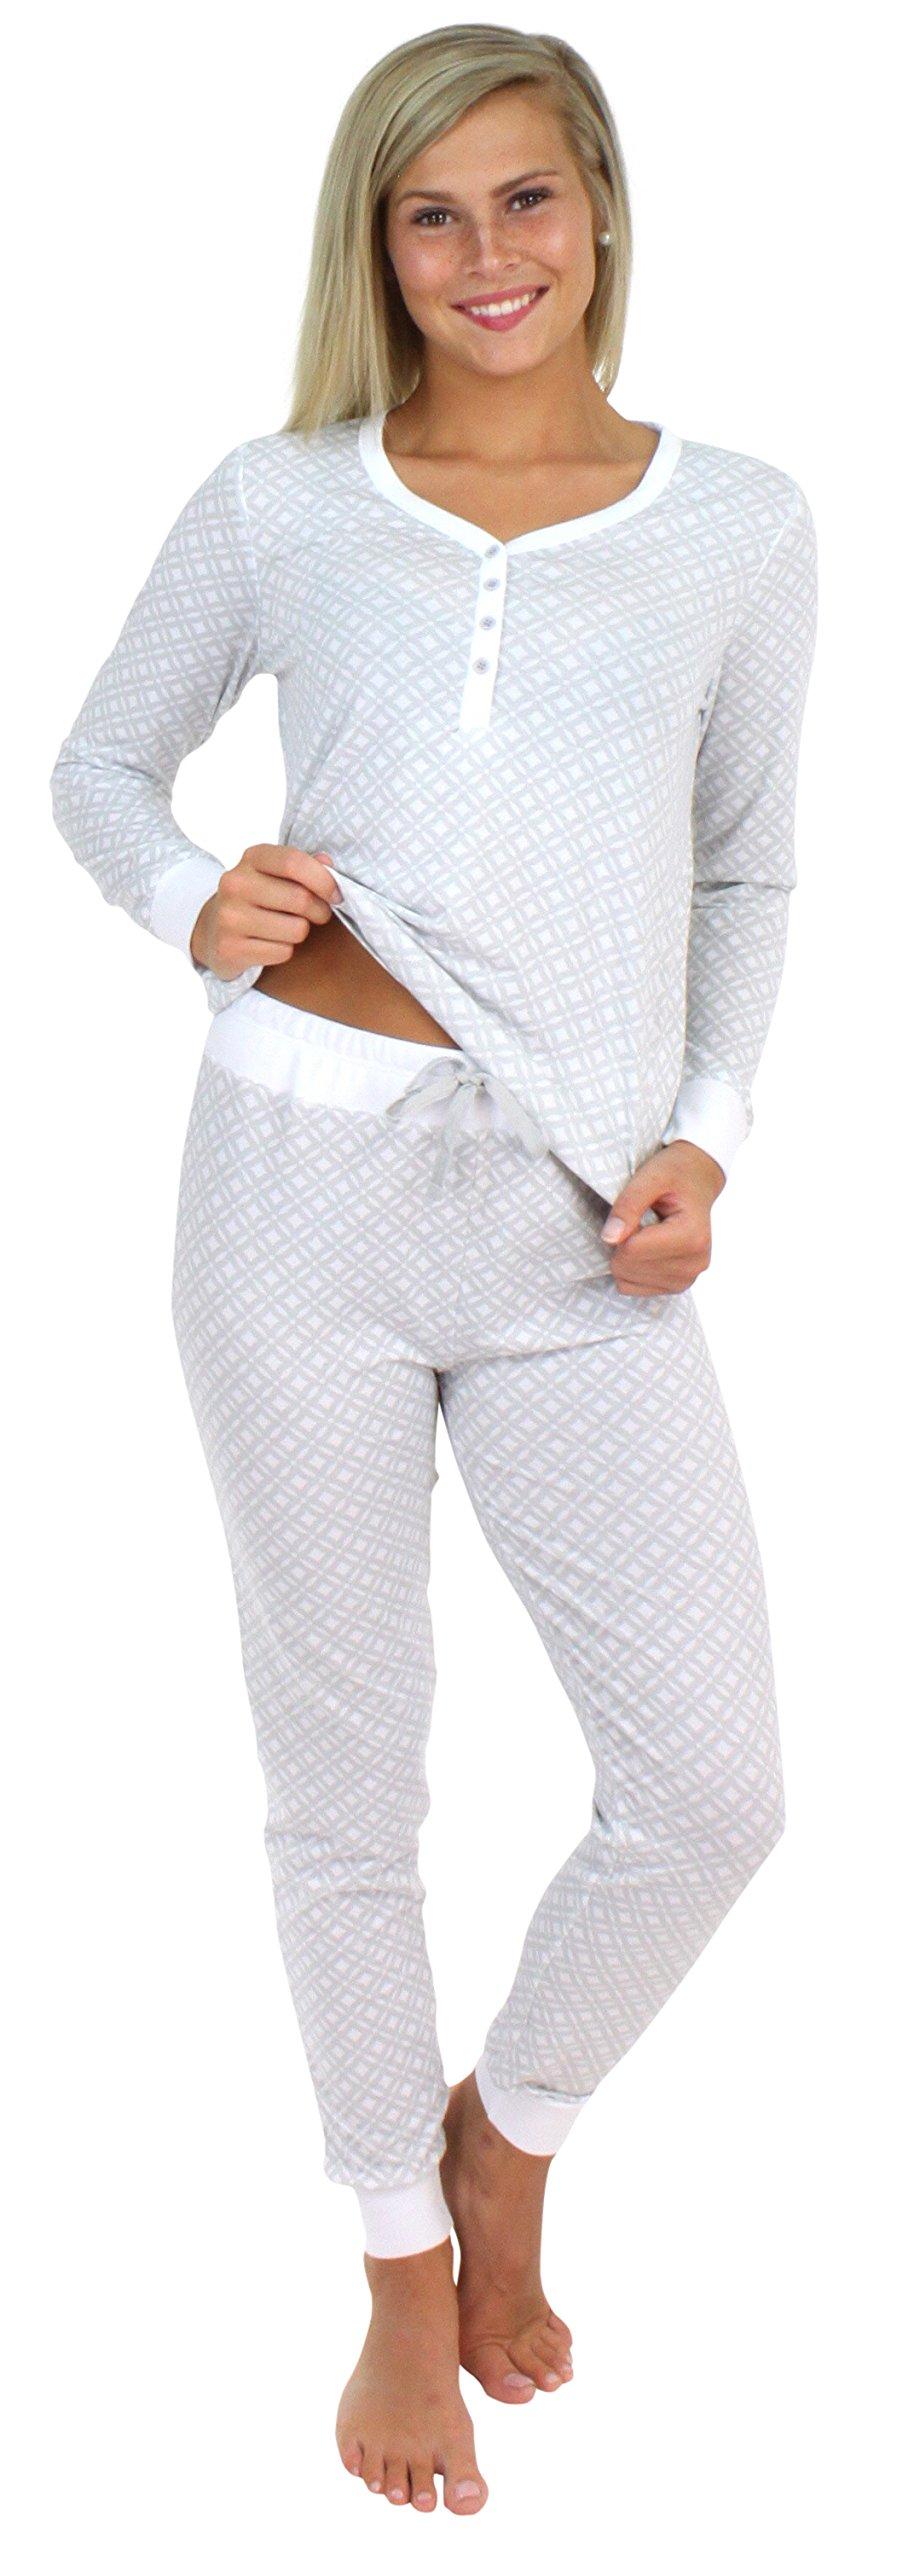 Sleepyheads Women's Sleepwear Knit Long Sleeve Henley and Pant Pajamas PJ Set-Sweet Dreams Grey (SH1150-4090-XL)